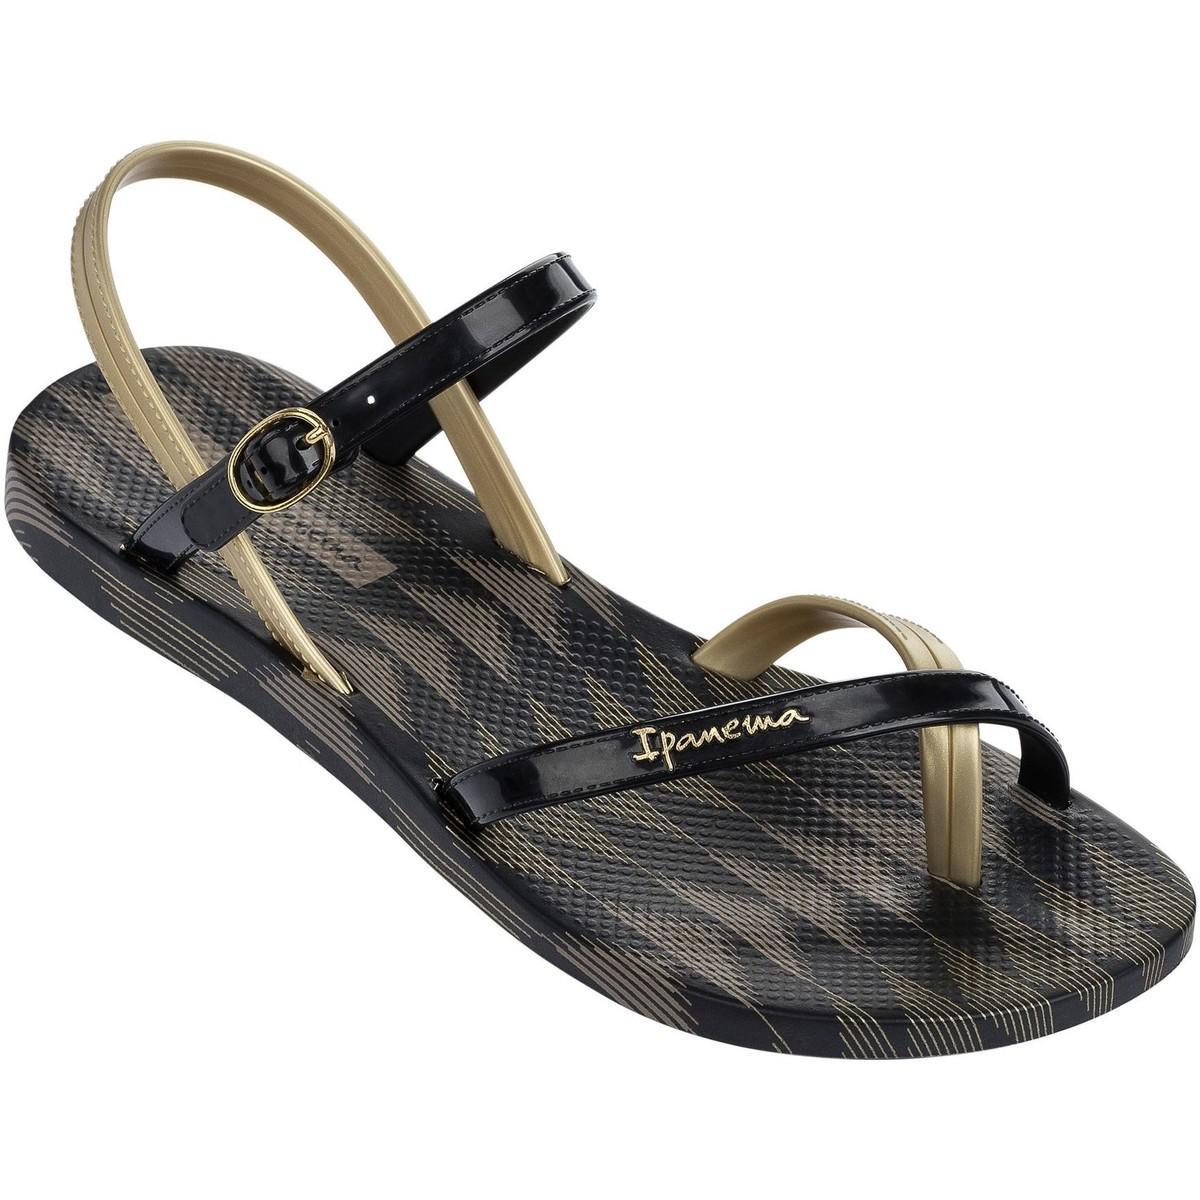 cf4a974beacba Ipanema Diamond V Sandals In Black Gold Print 81929 Women's Flip ...